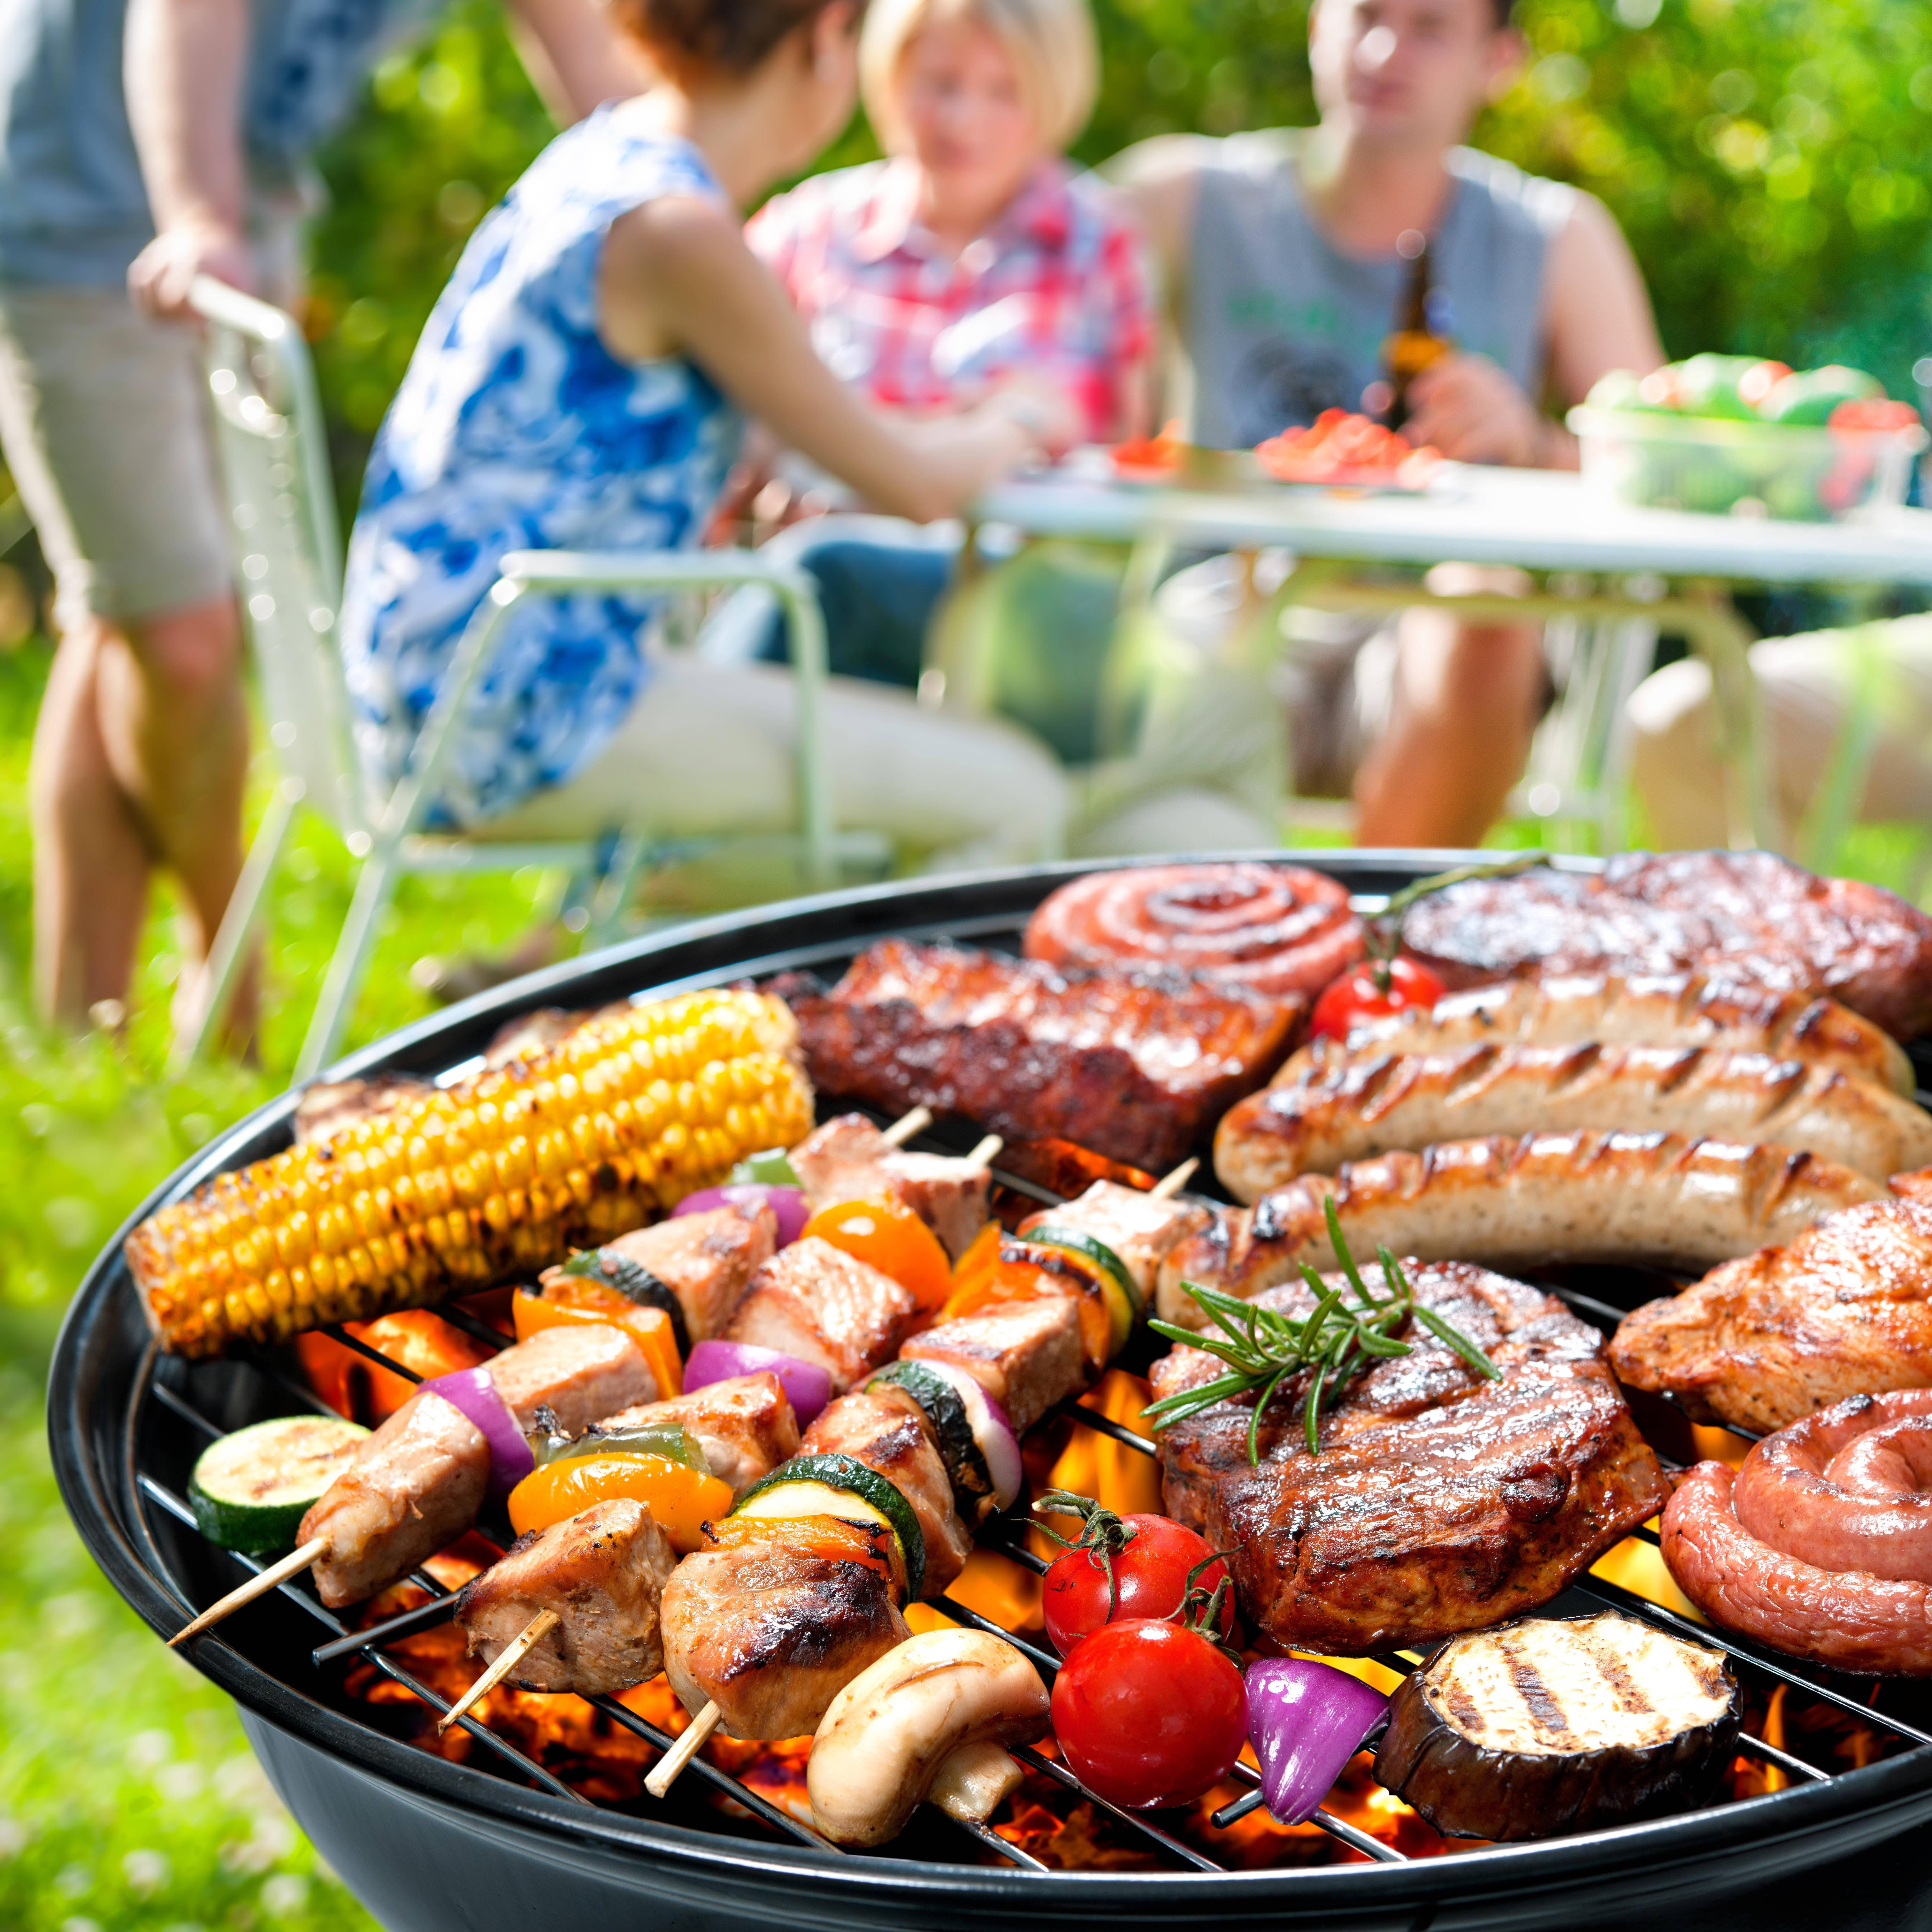 c27914cf980e38f0e1fa_barbecue_party.jpeg